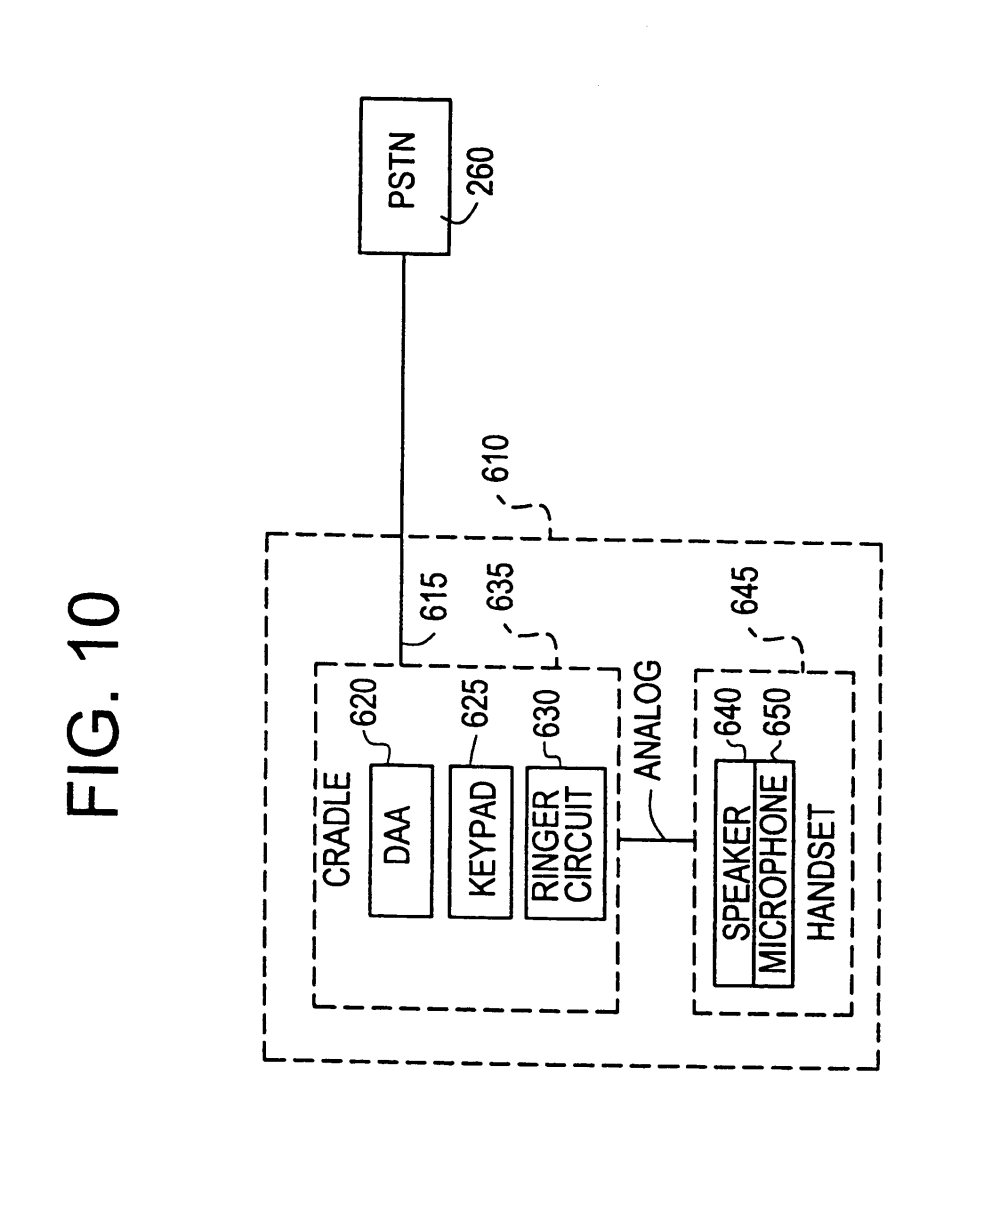 medium resolution of 1979 f150 wiper switch wiring diagram